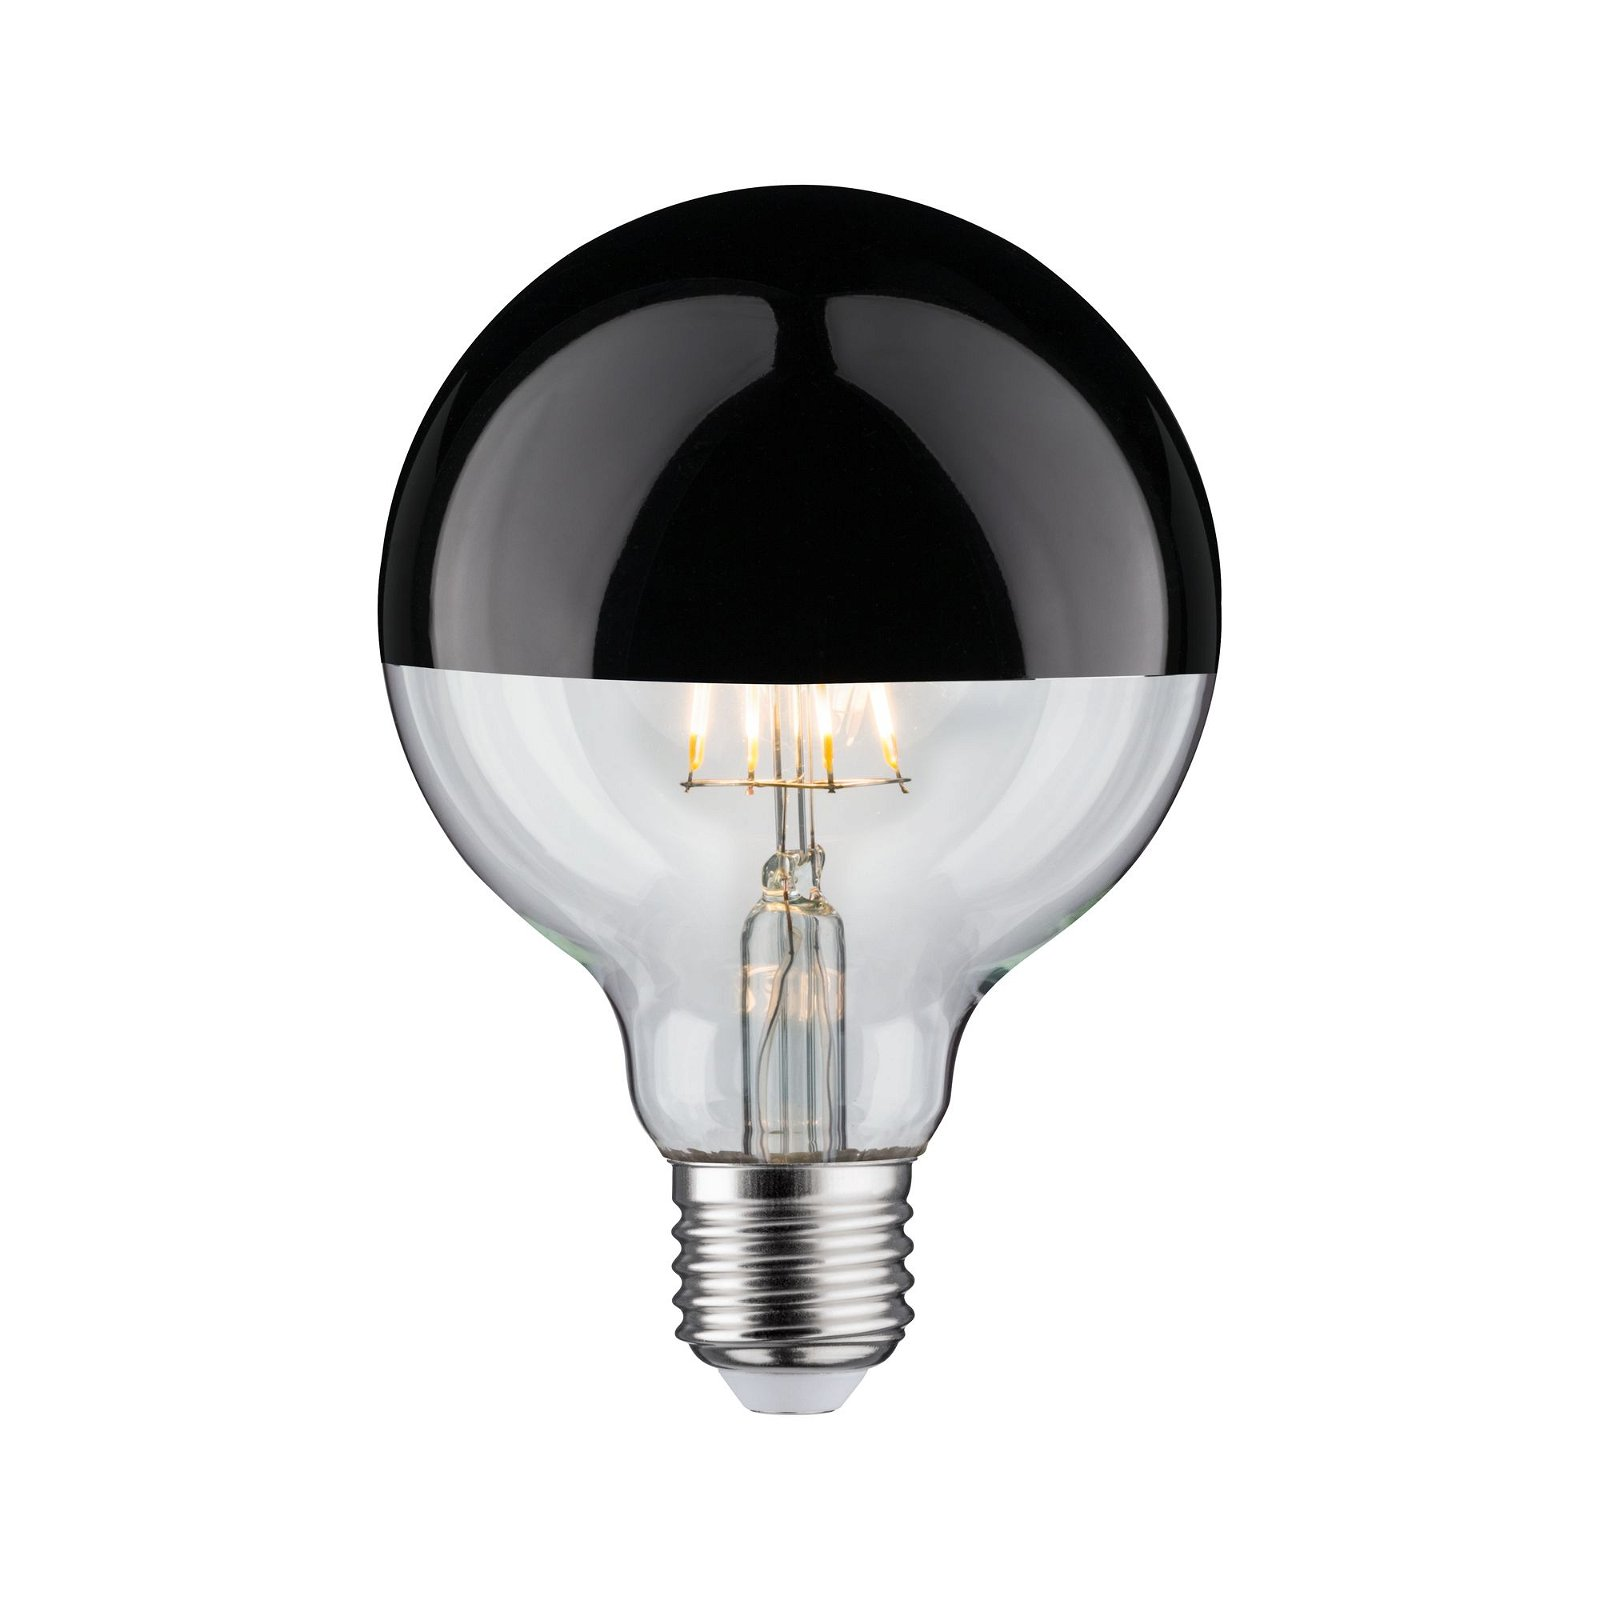 Modern Classic Edition LED Globe Kopfspiegel E27 230V 600lm 6,5W 2700K Kopfspiegel Schwarzchrom